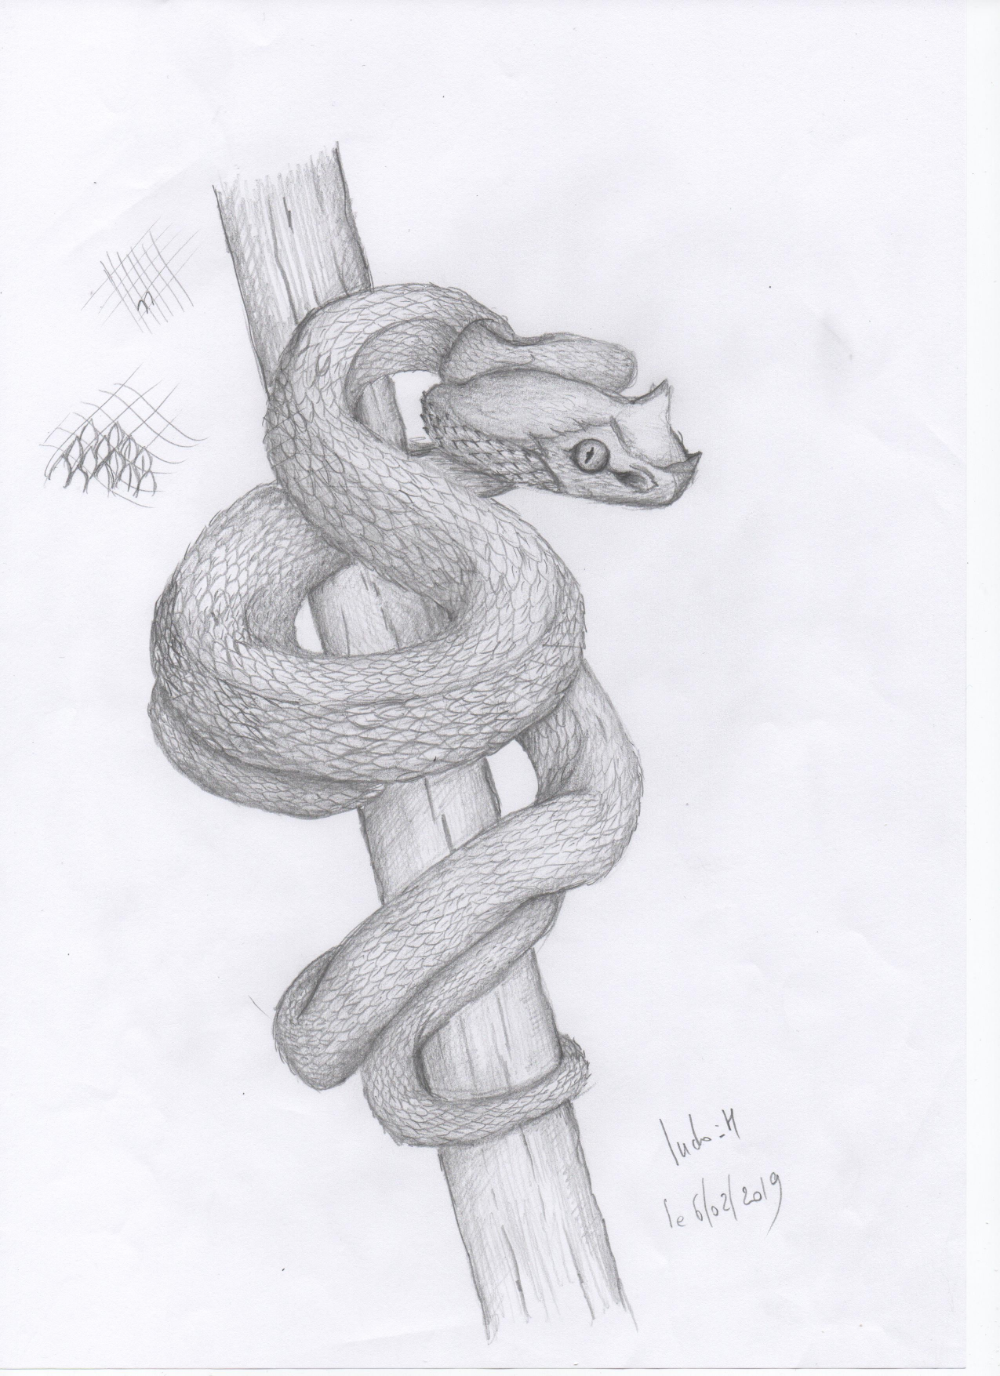 Comment Dessiner Un Serpent Dessin Serpent Dessin Comment Dessiner